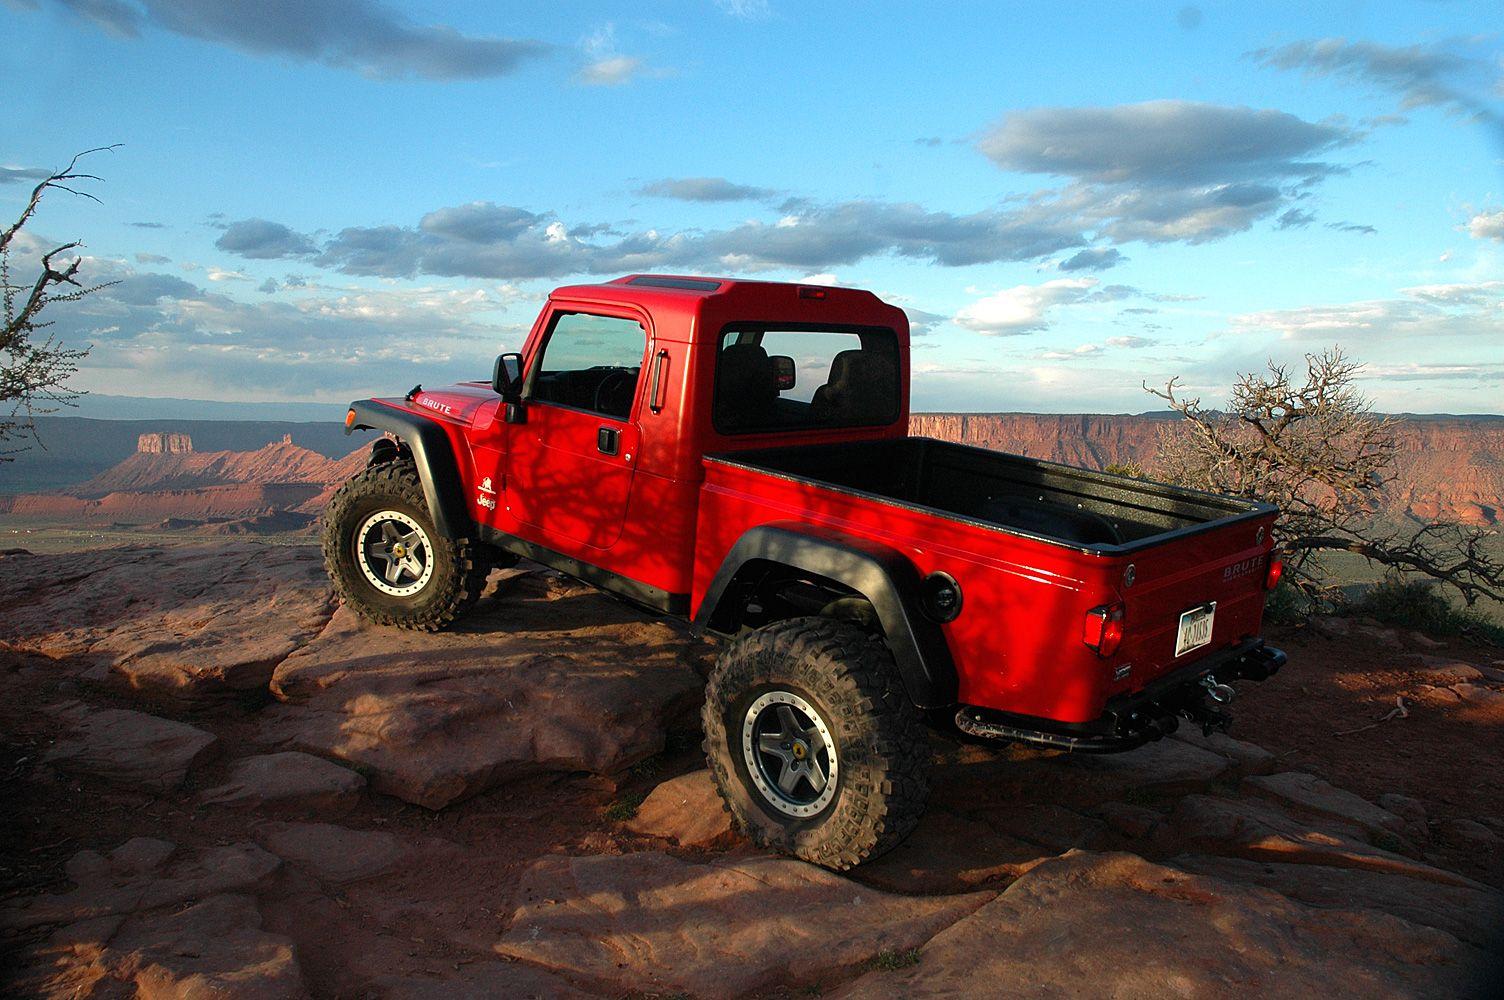 Brute truck conversion kit for jeep wrangler